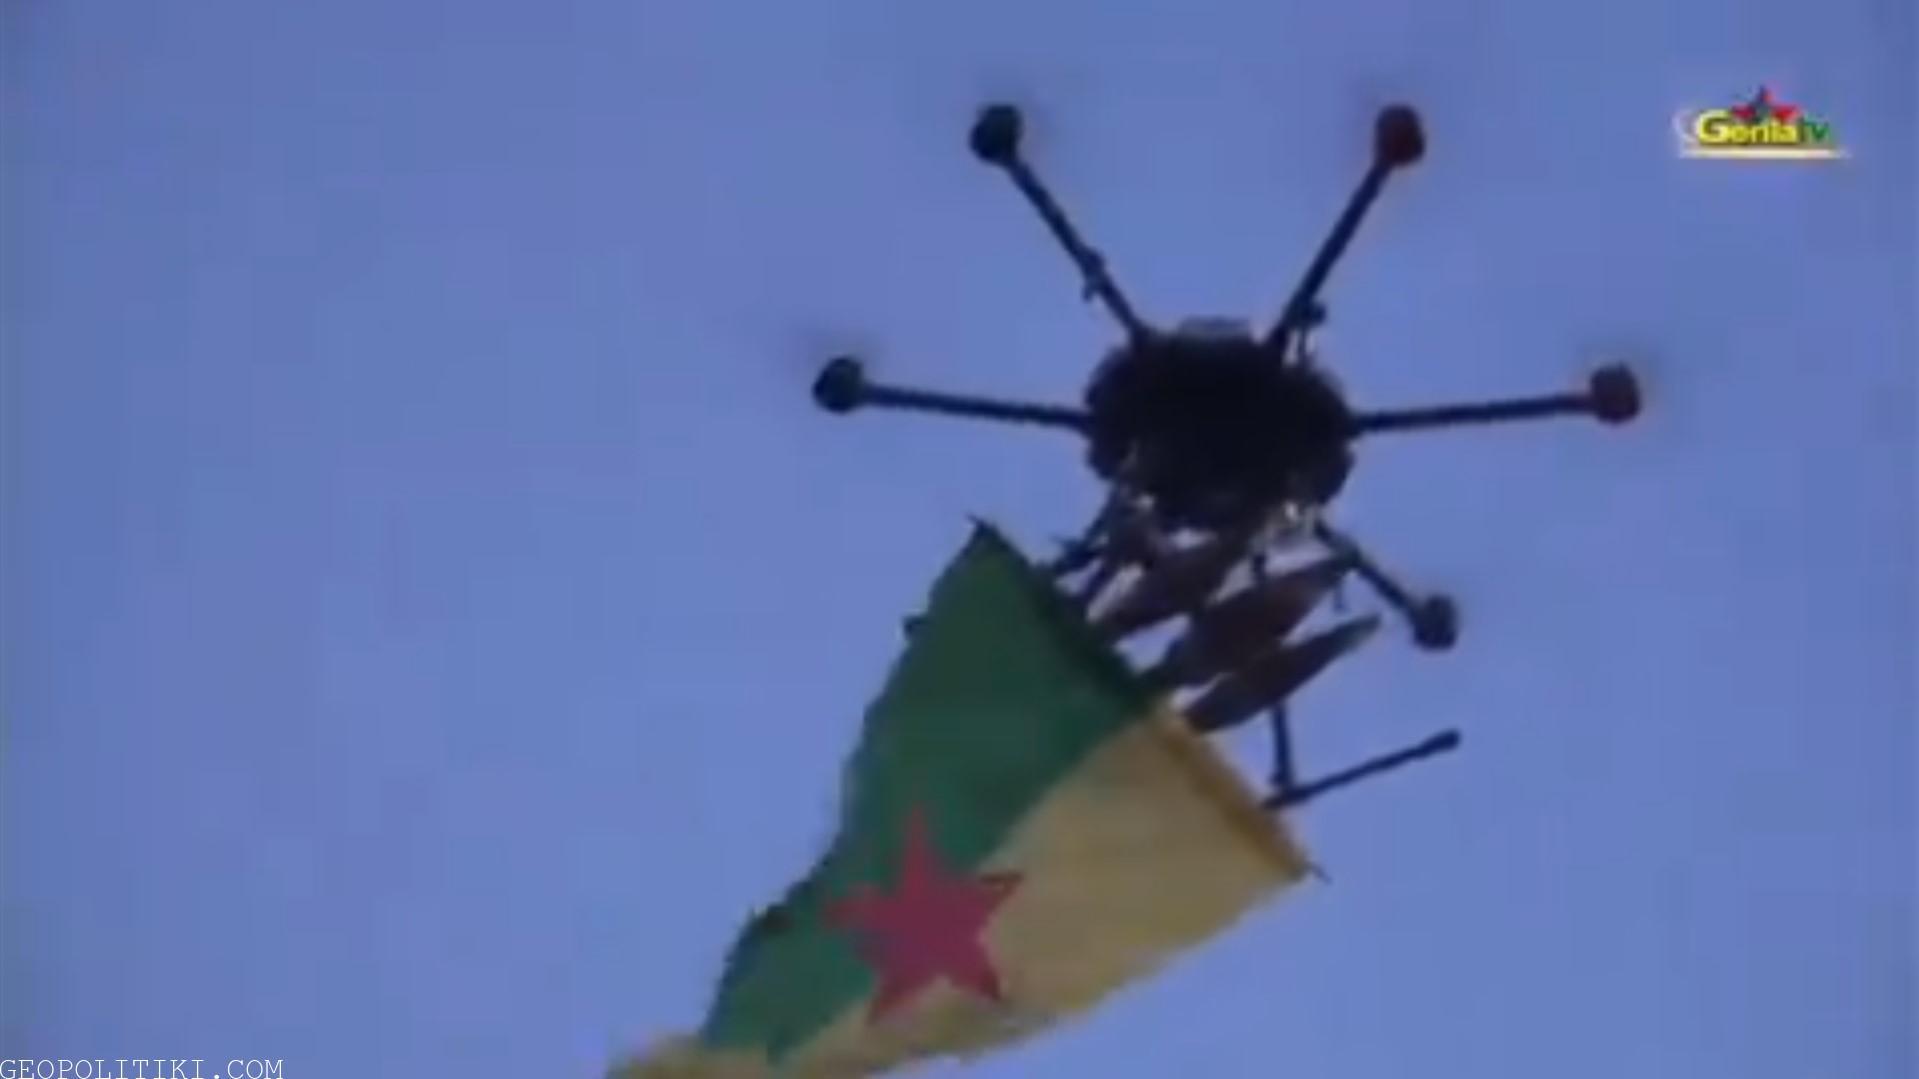 BREAKING: Kurds Released Footage Of Drone Strike Against Turkish Base